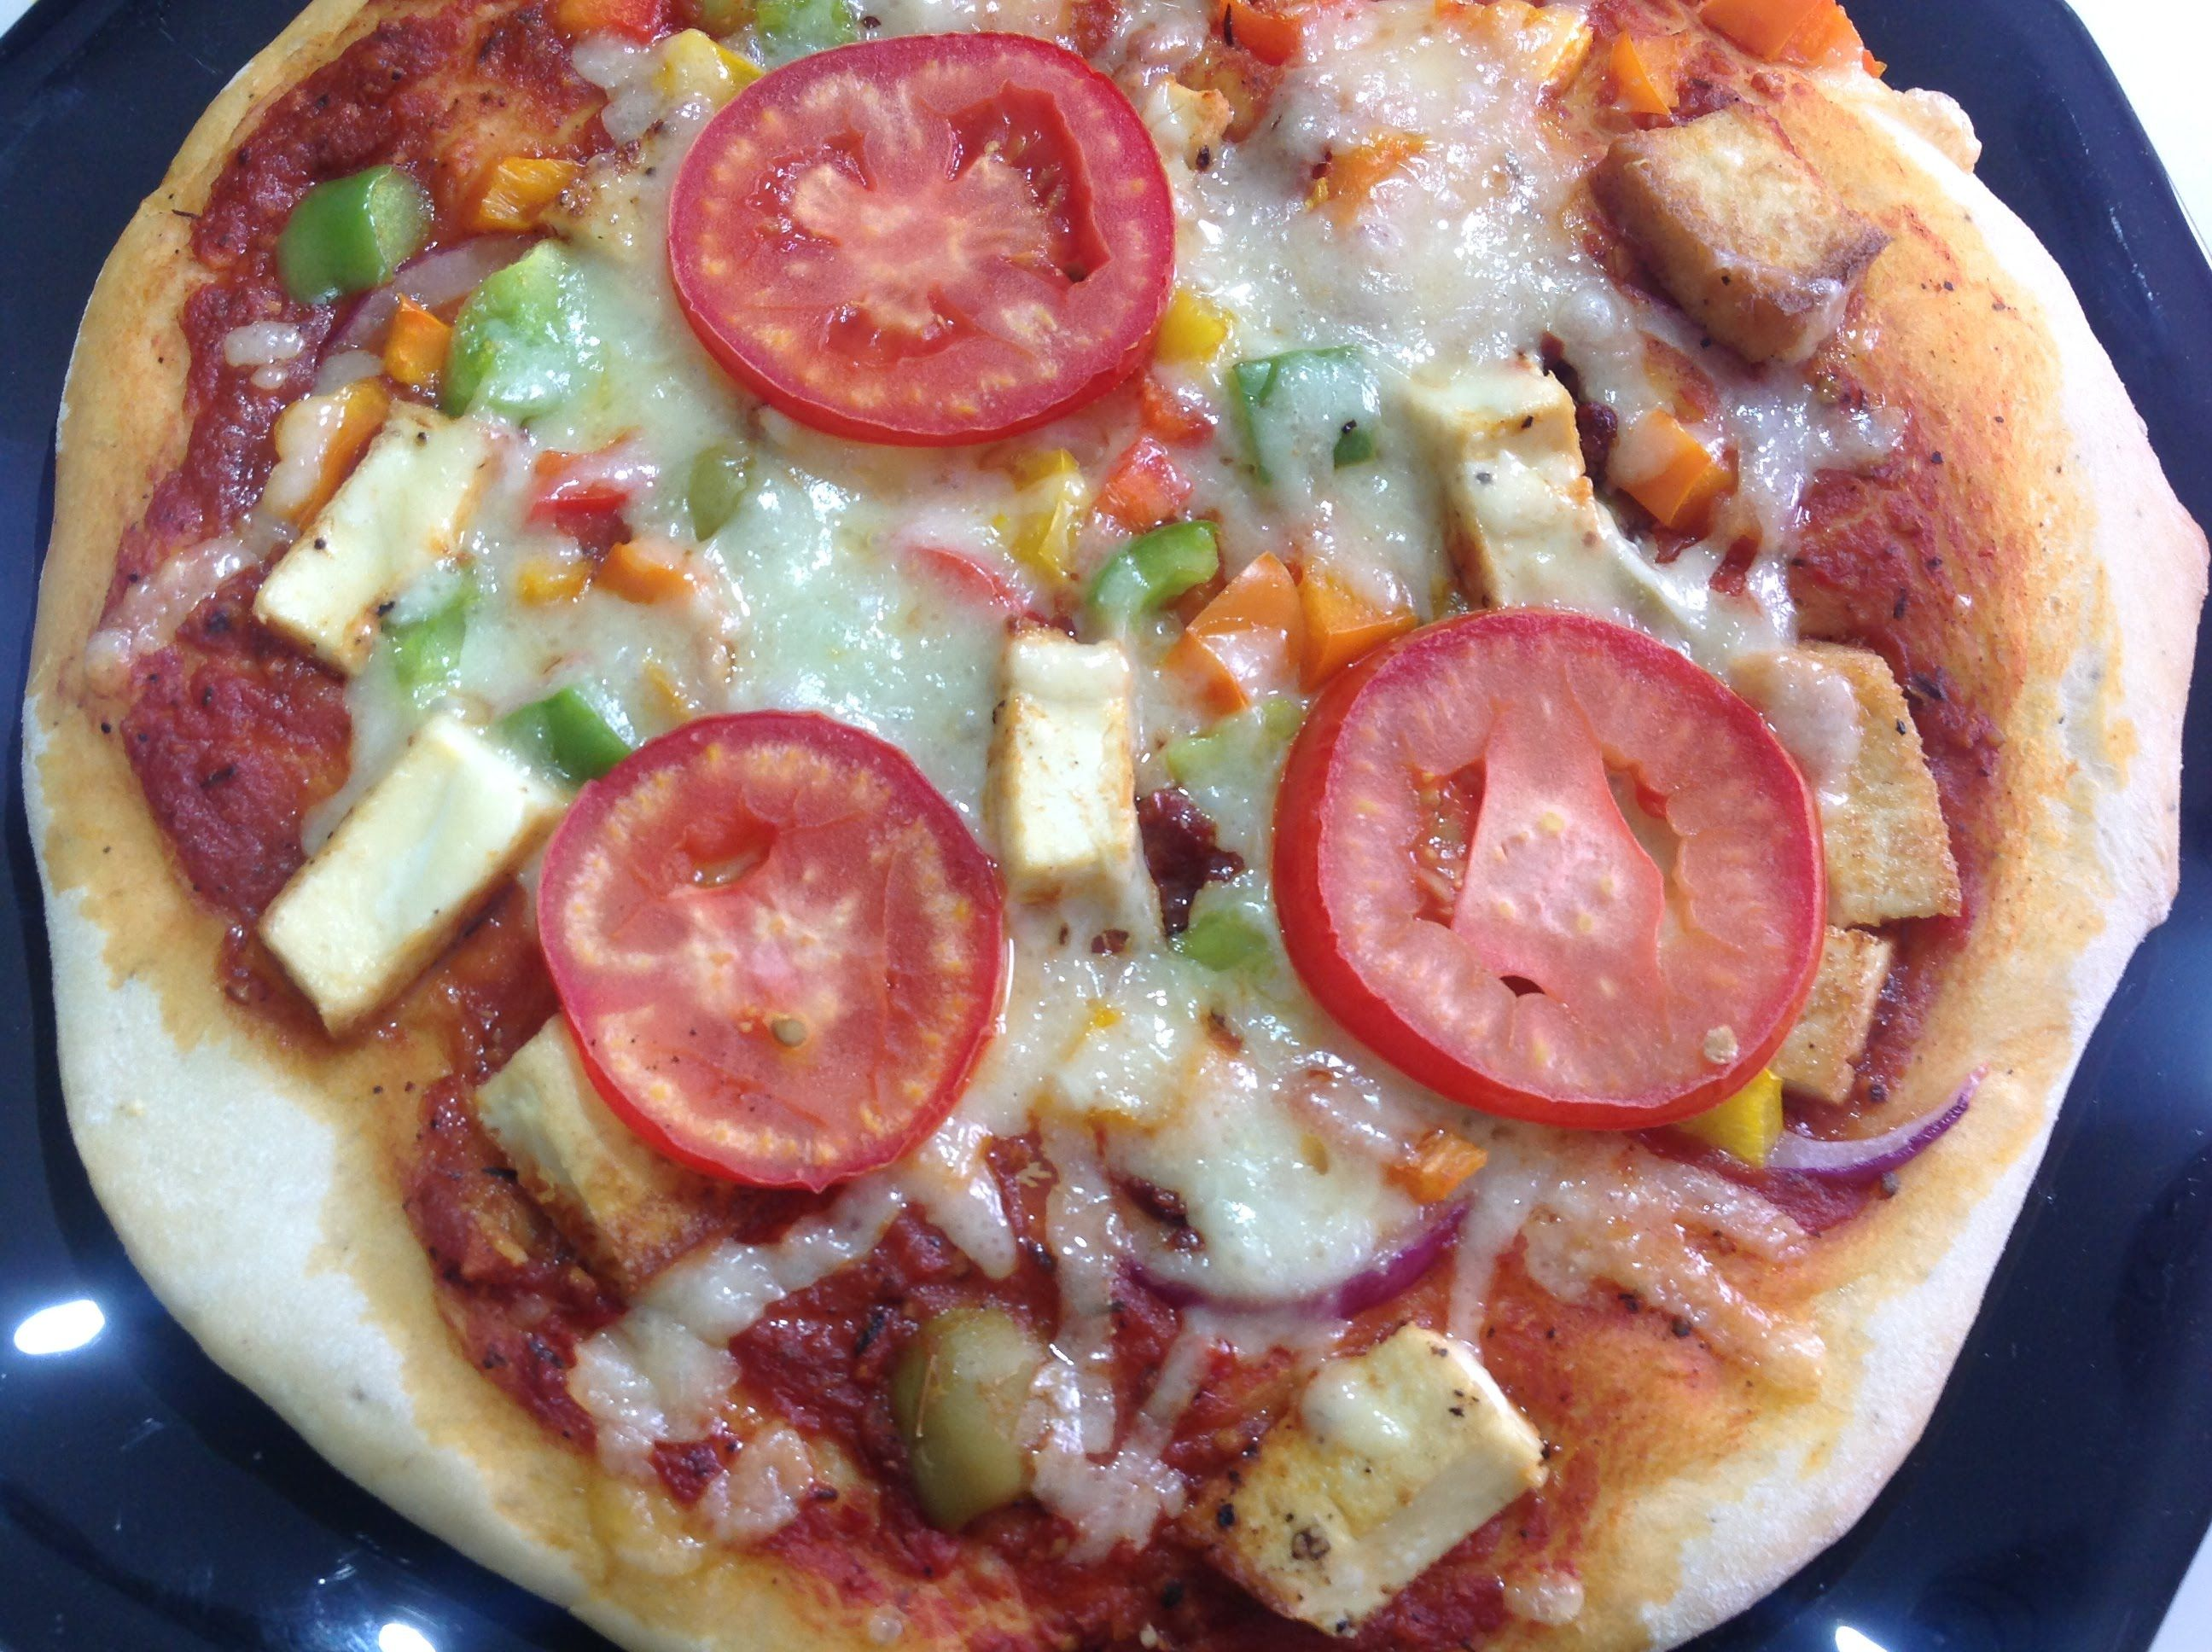 طريقة عمل بيتزا صيامى Vegetarian Recipes Recipes Vegetarian